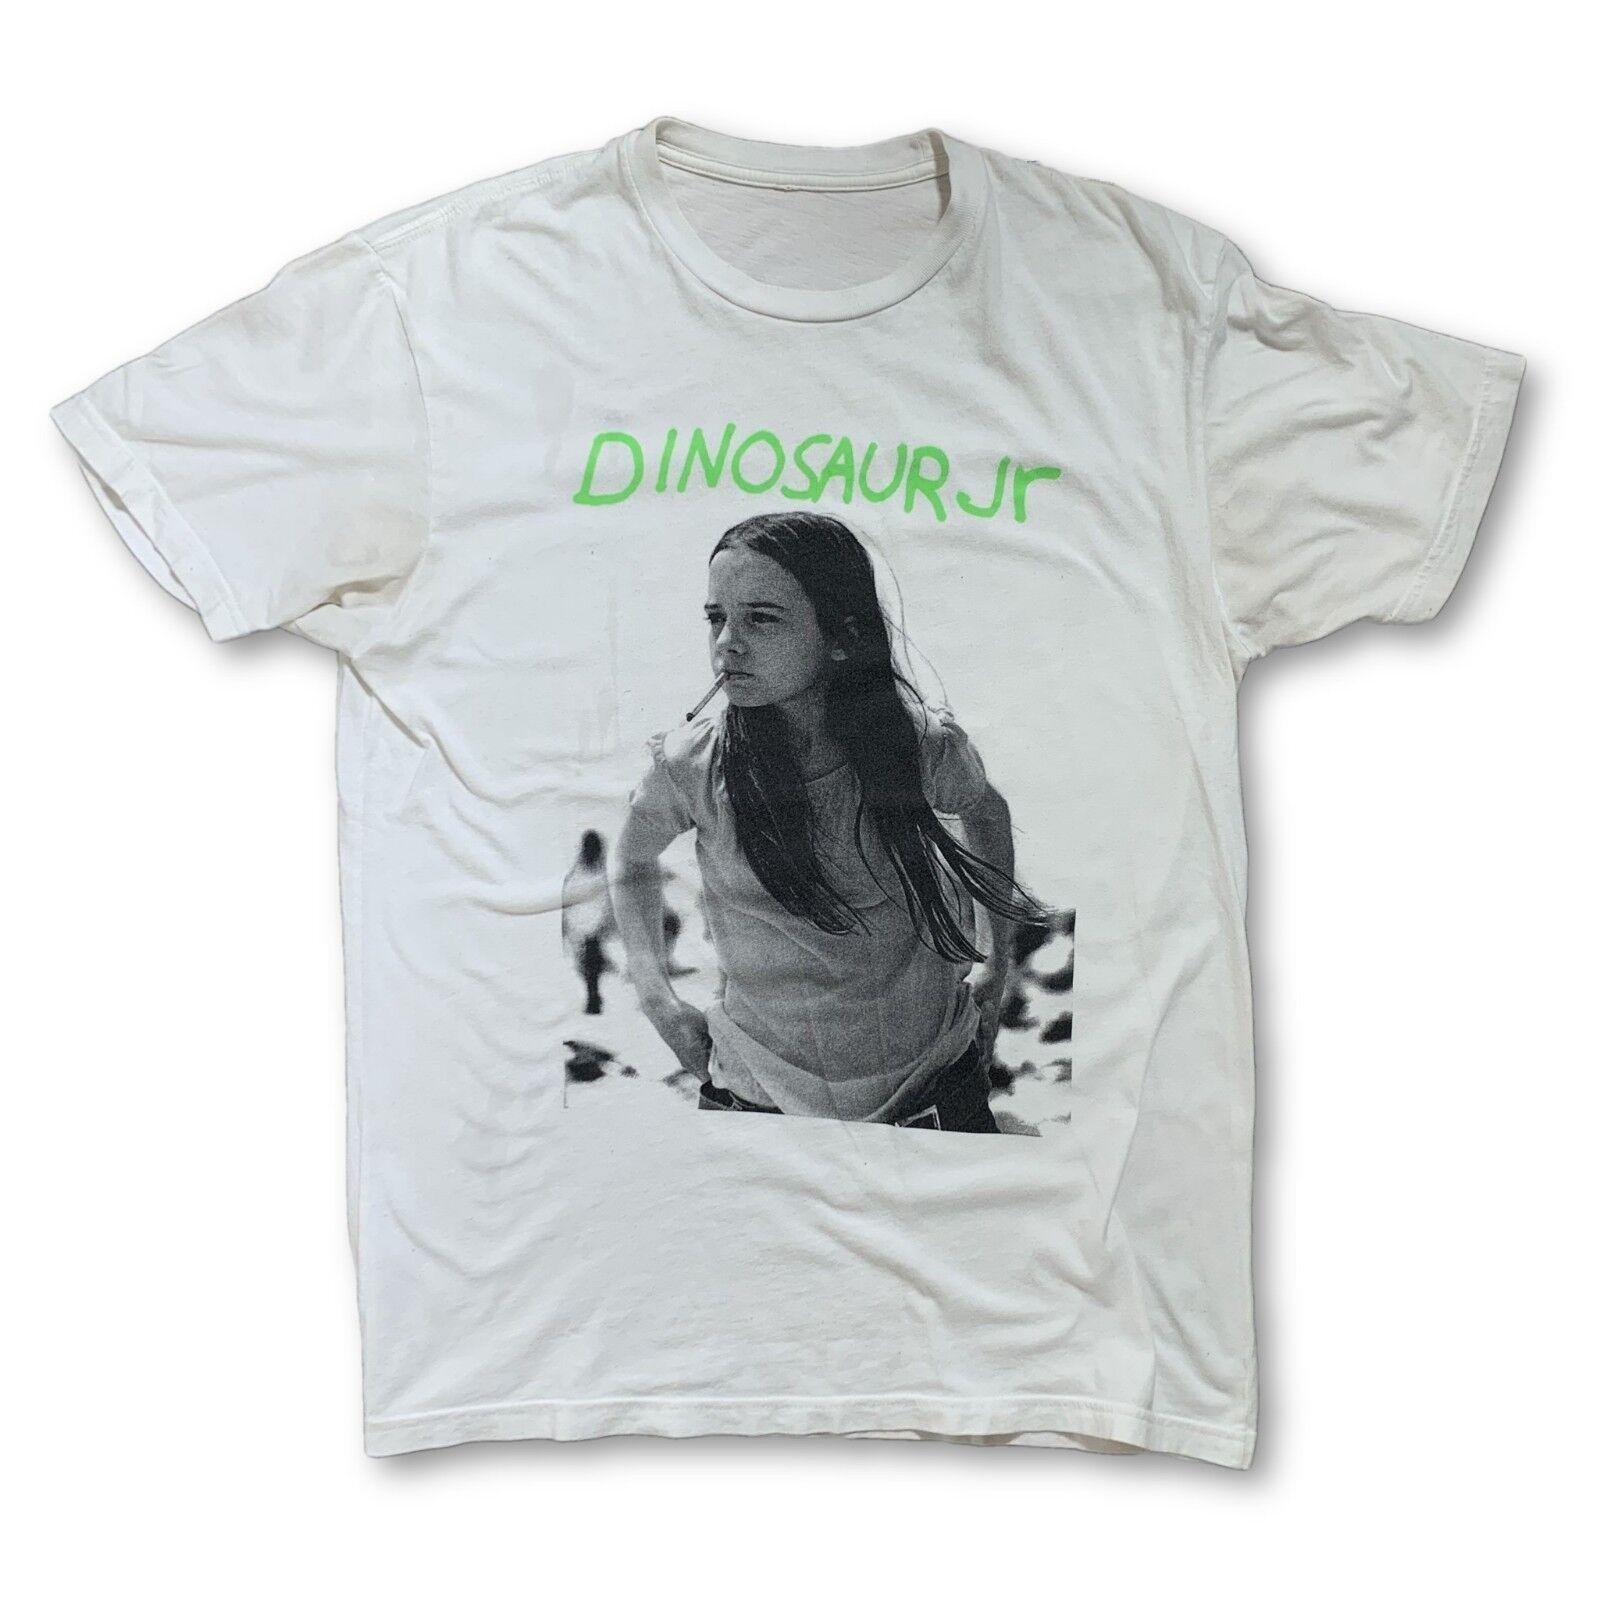 Vintage VTG 90s Dinosaur JR White T-Shirt my bloo… - image 1